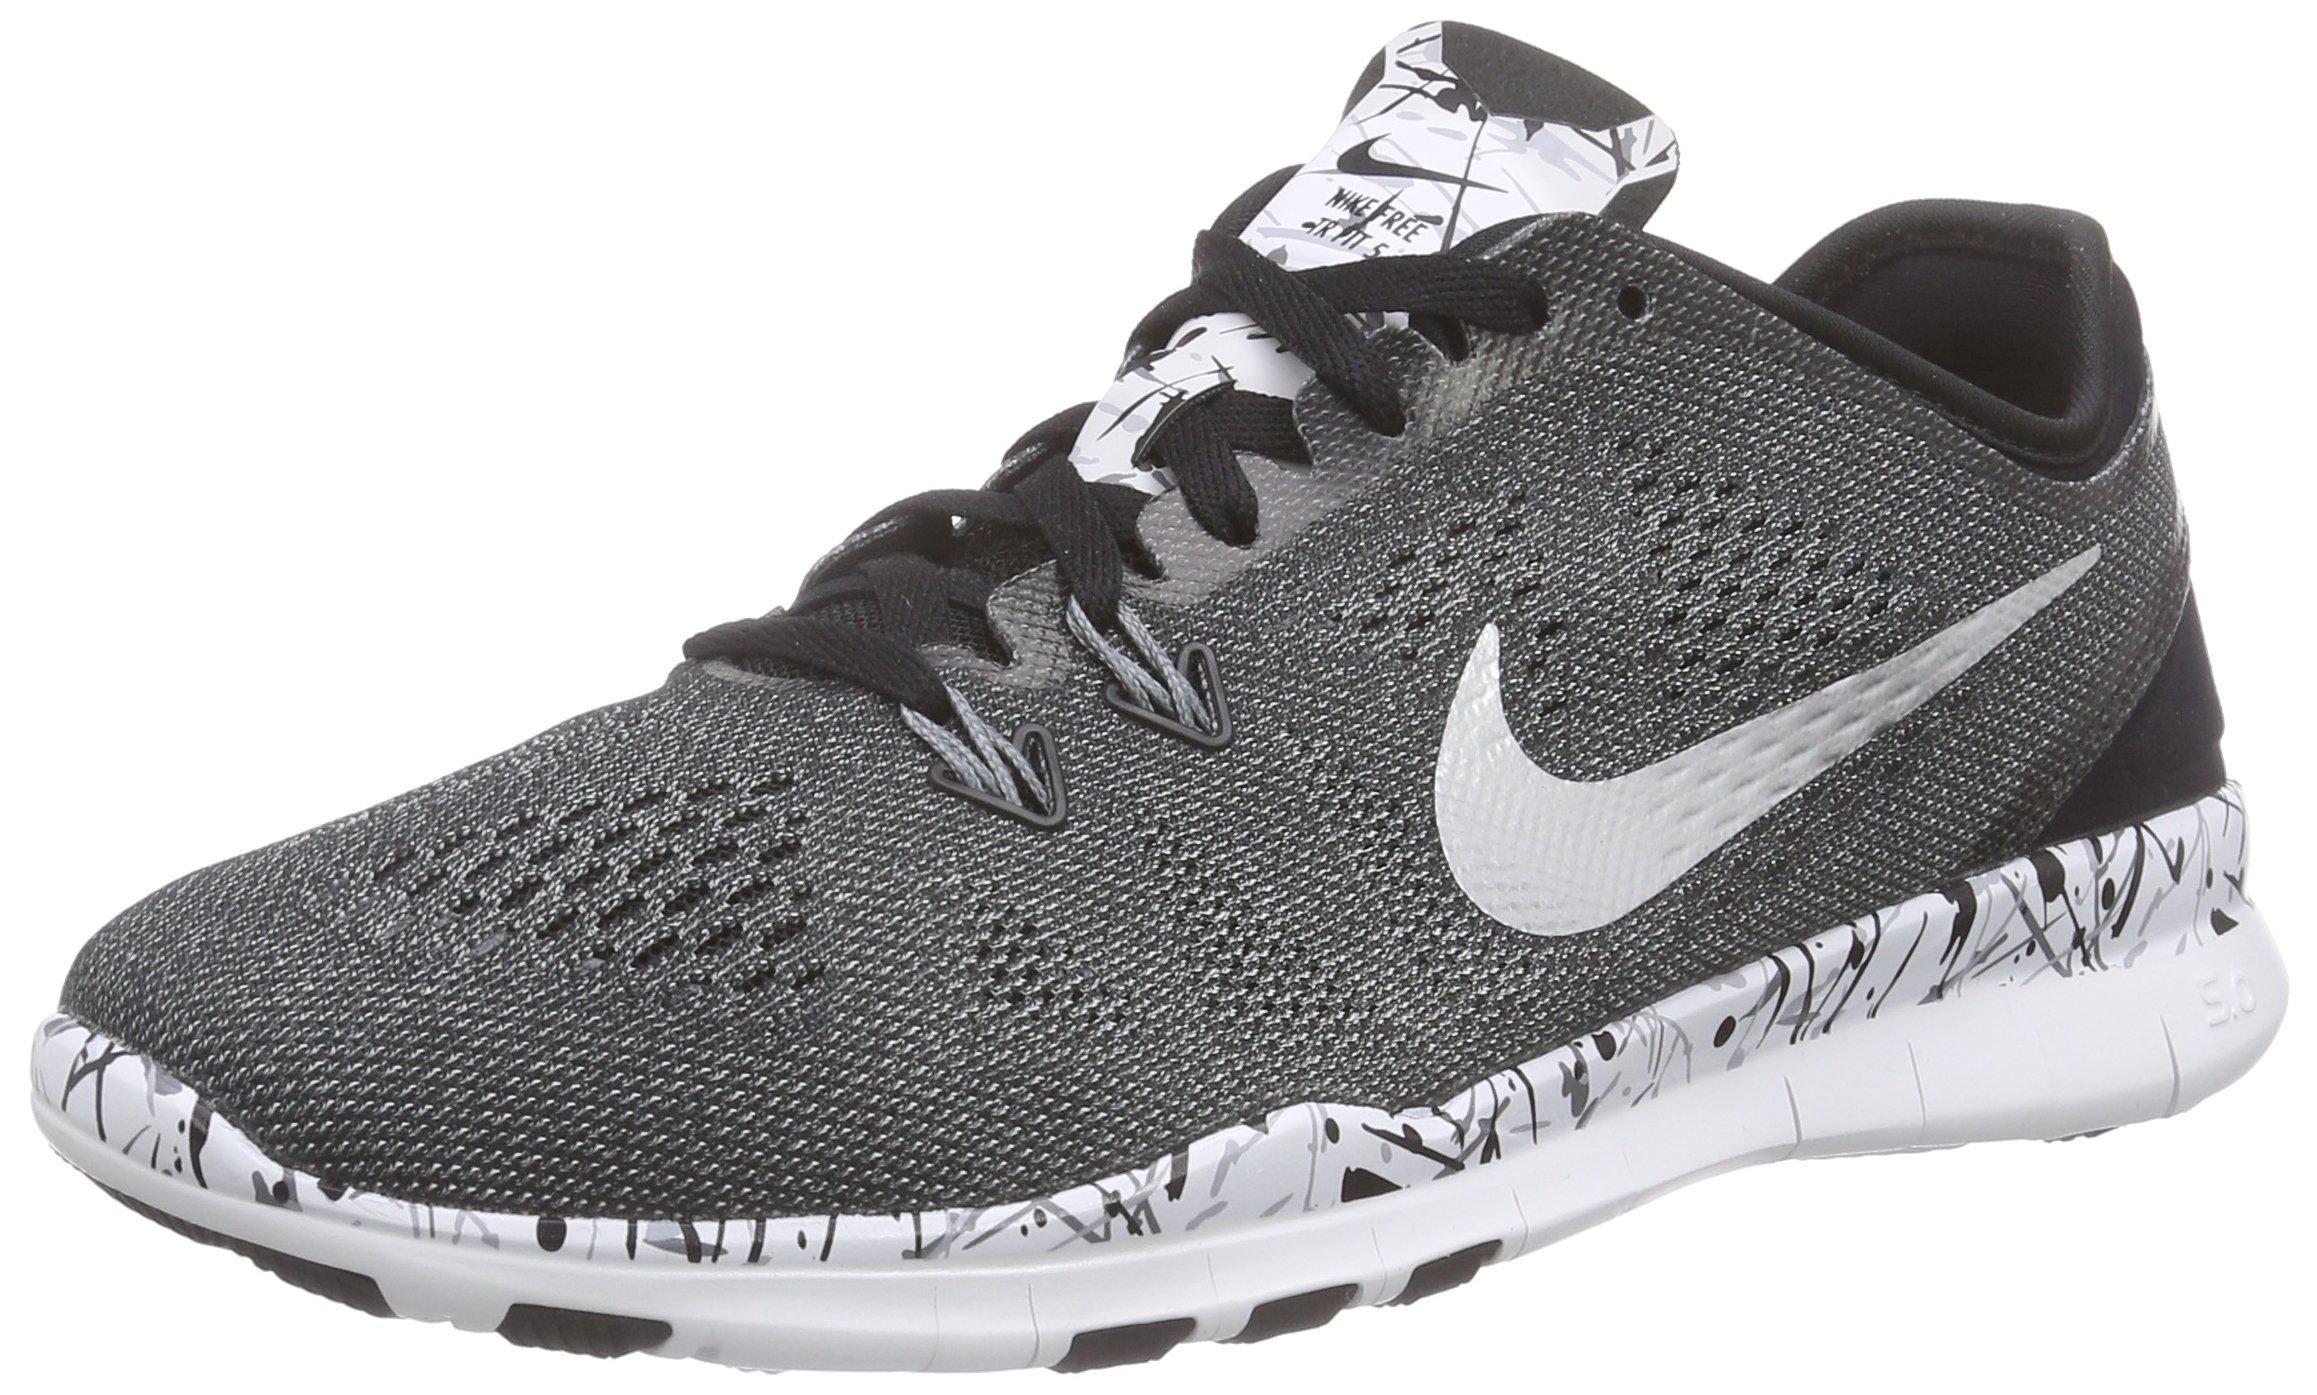 Nike Women's Free 5.0 TR Fit 5 Print Training Shoe Black/White/Grey/Metallic Silver Size 8 M US